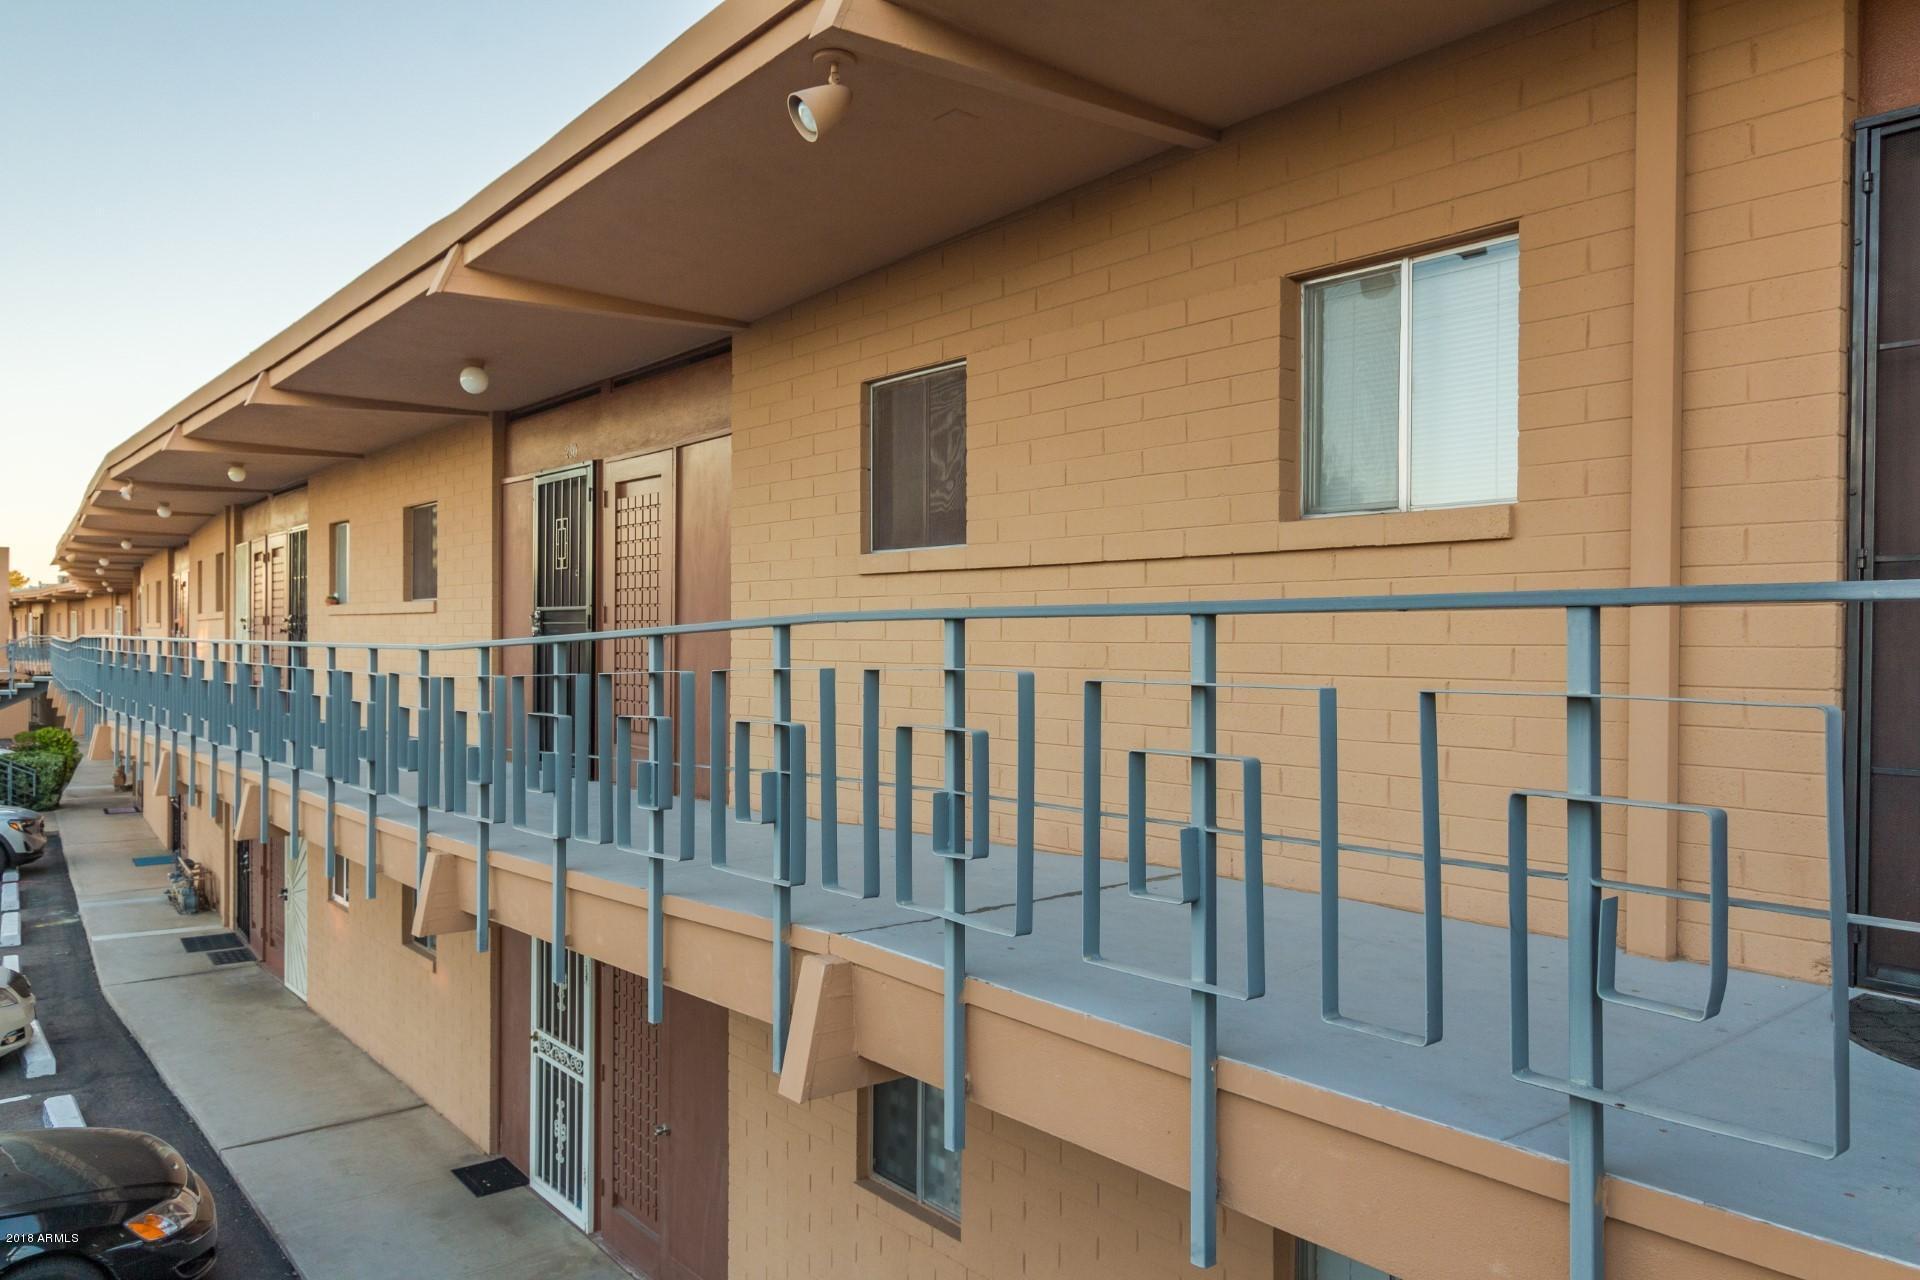 MLS 5938810 6125 E INDIAN SCHOOL Road Unit 282, Scottsdale, AZ 85251 Scottsdale AZ Old Town Scottsdale